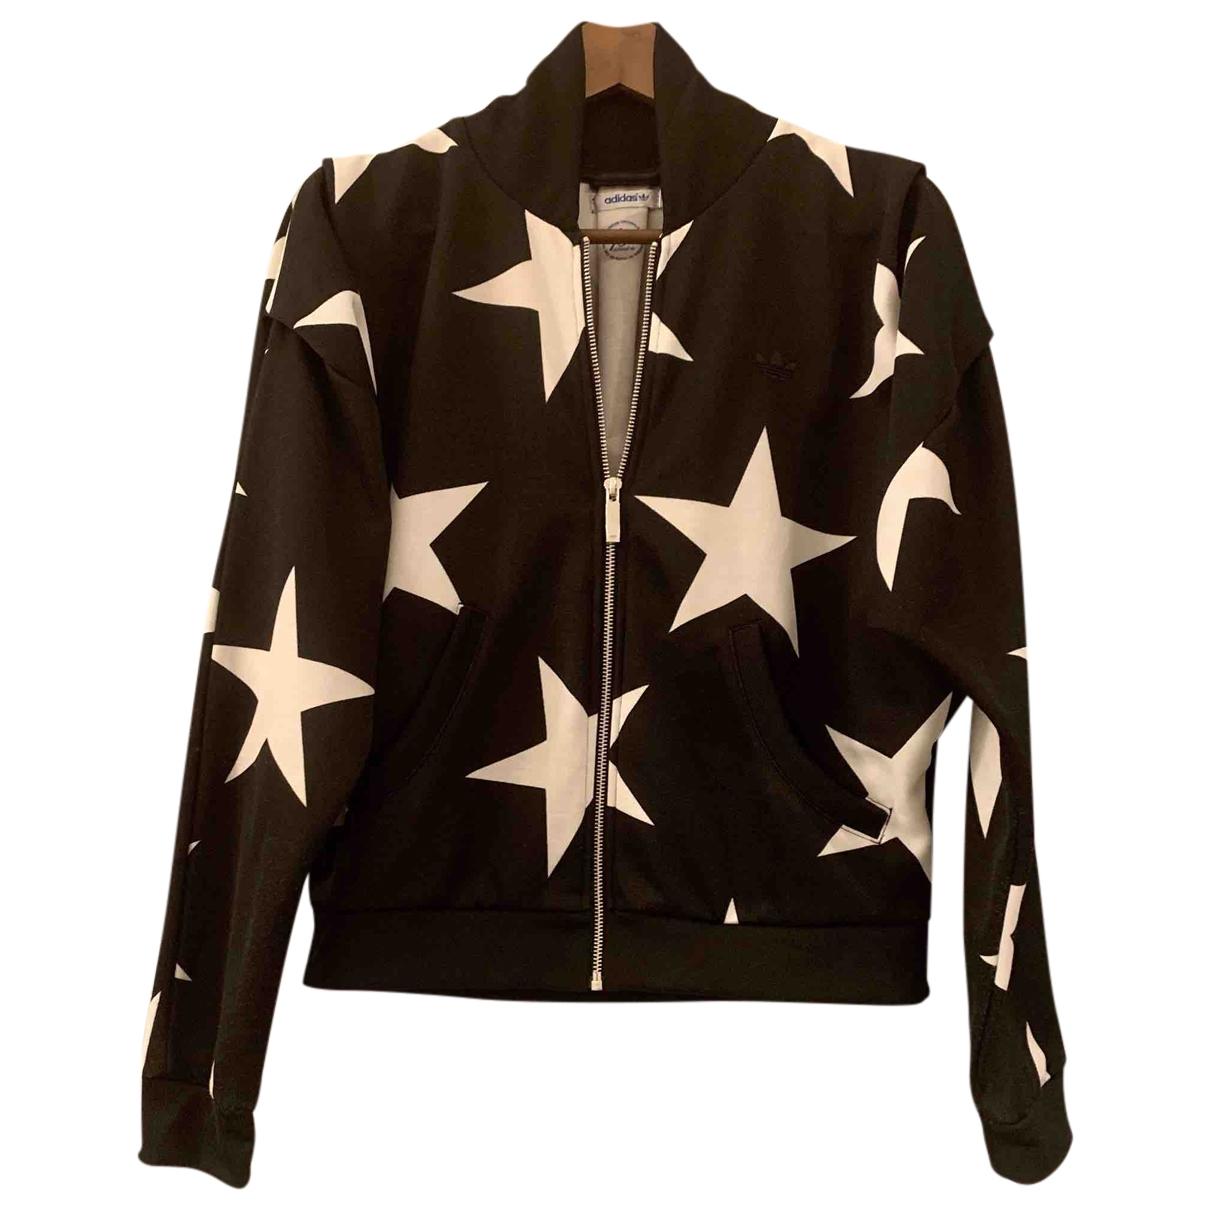 Adidas \N Black jacket for Women 48 IT